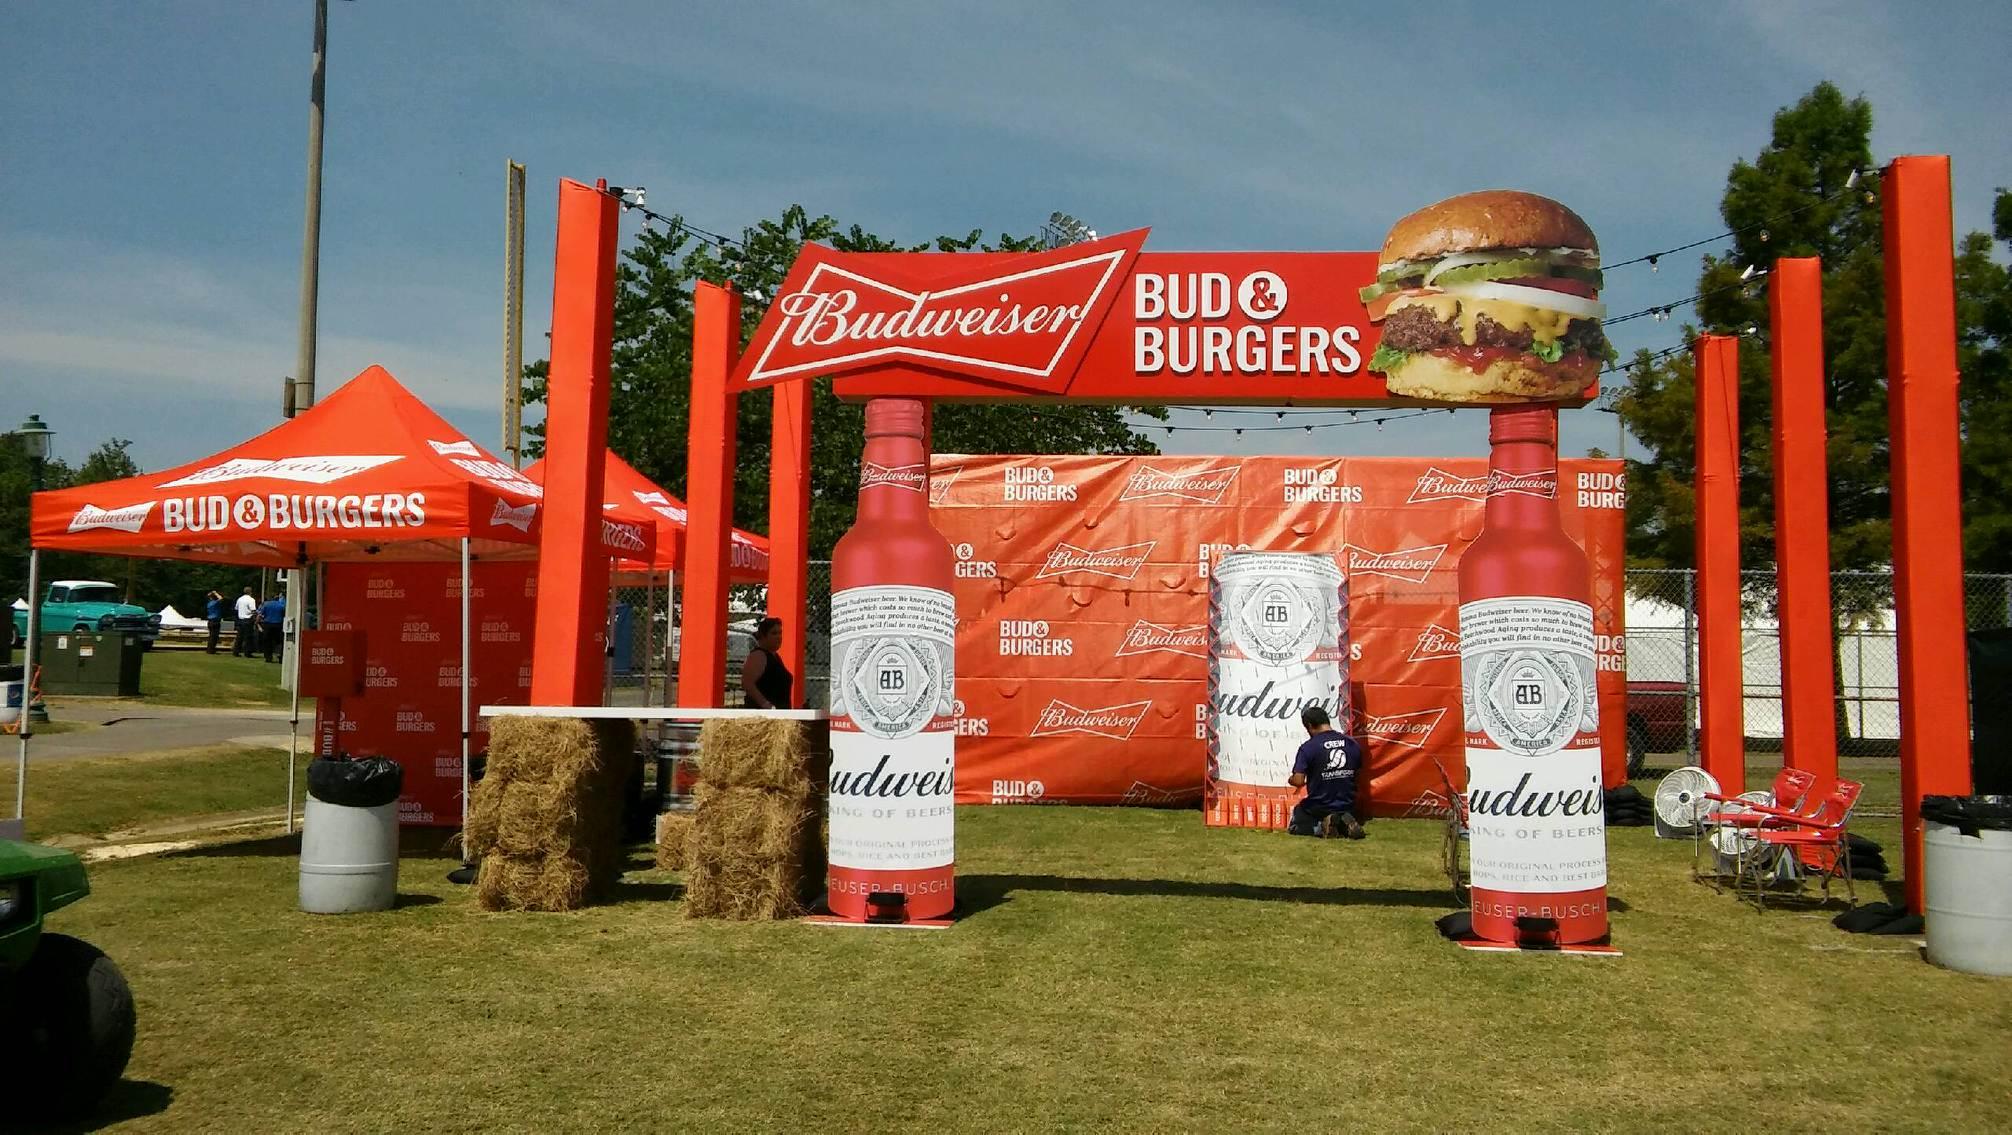 buds & burgers insite hospitality